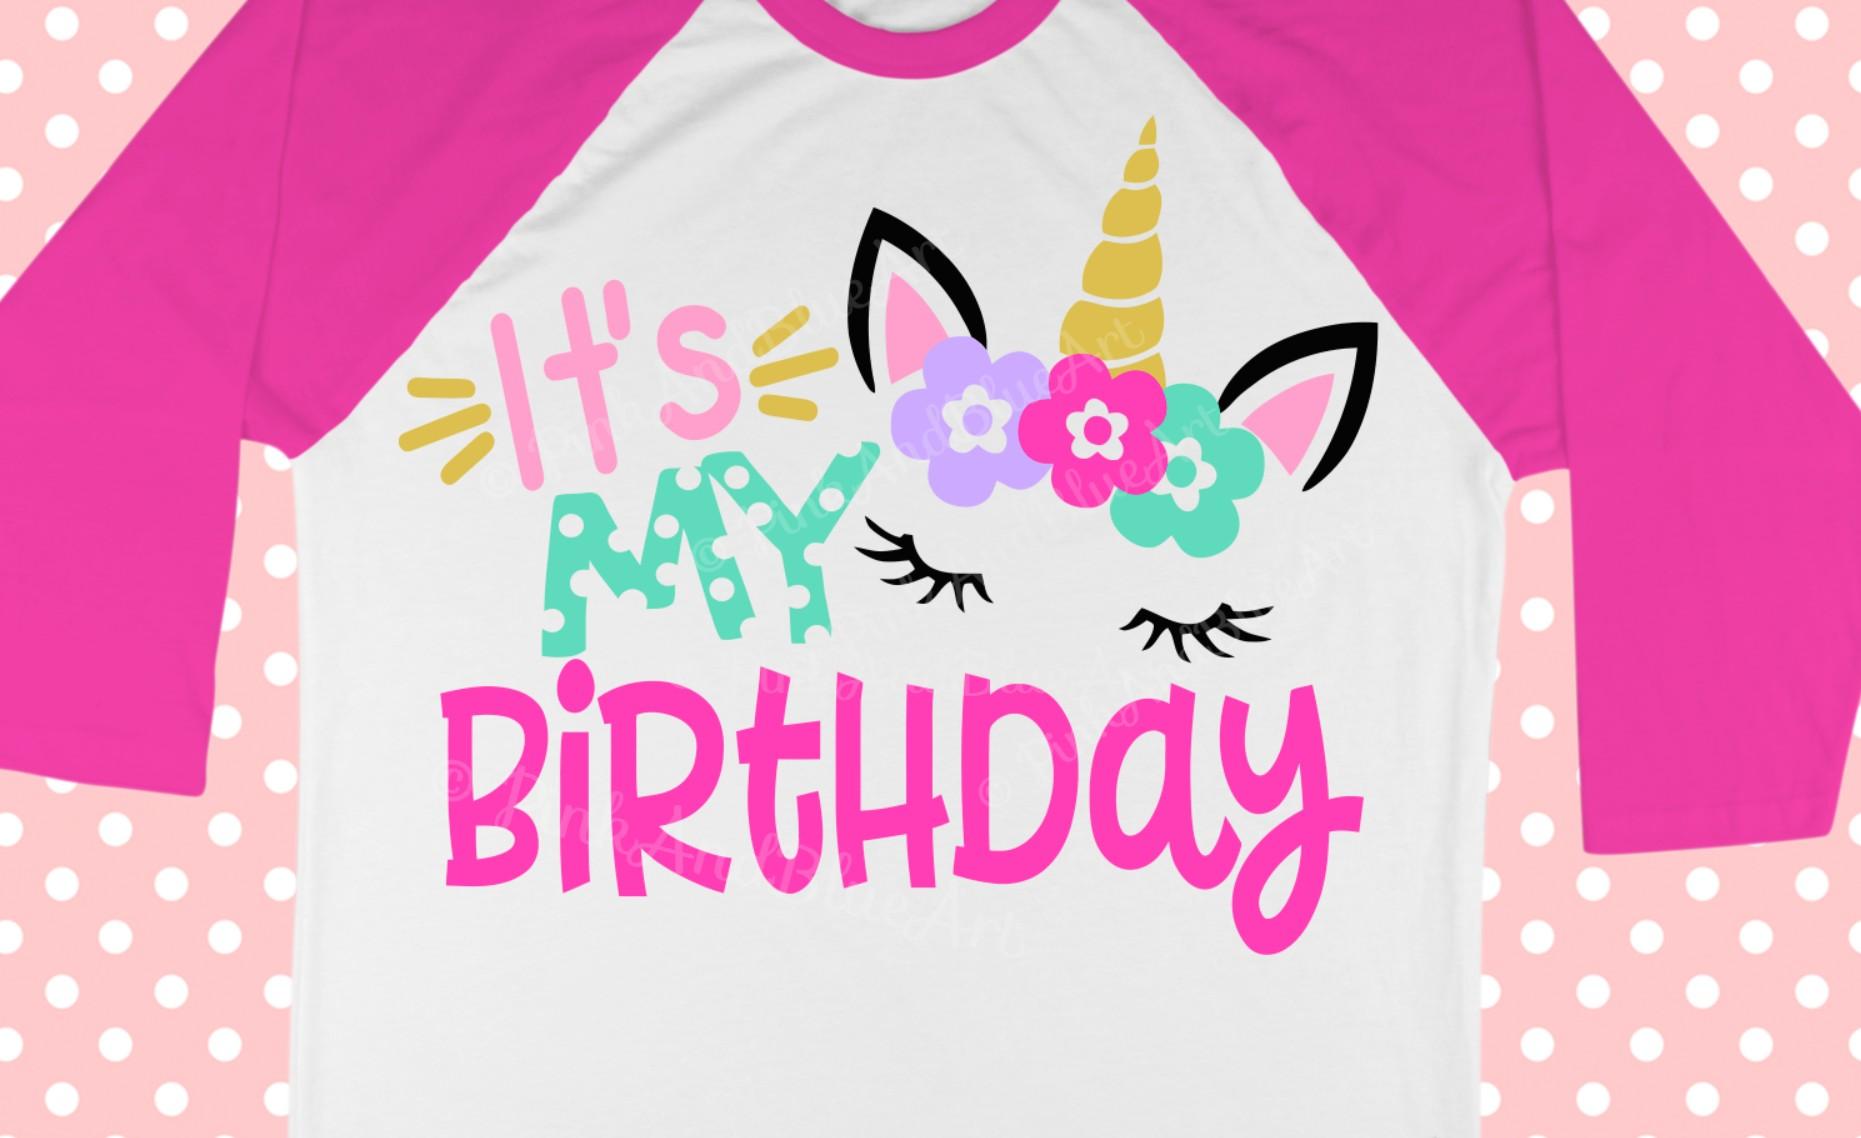 Unicorn Head Unicorn Birthday Svg Unicorn Birthday Cricut 2 Years Old Unicorn Birthday Unicorn Birthday Design Unicorn Birthday Shirt